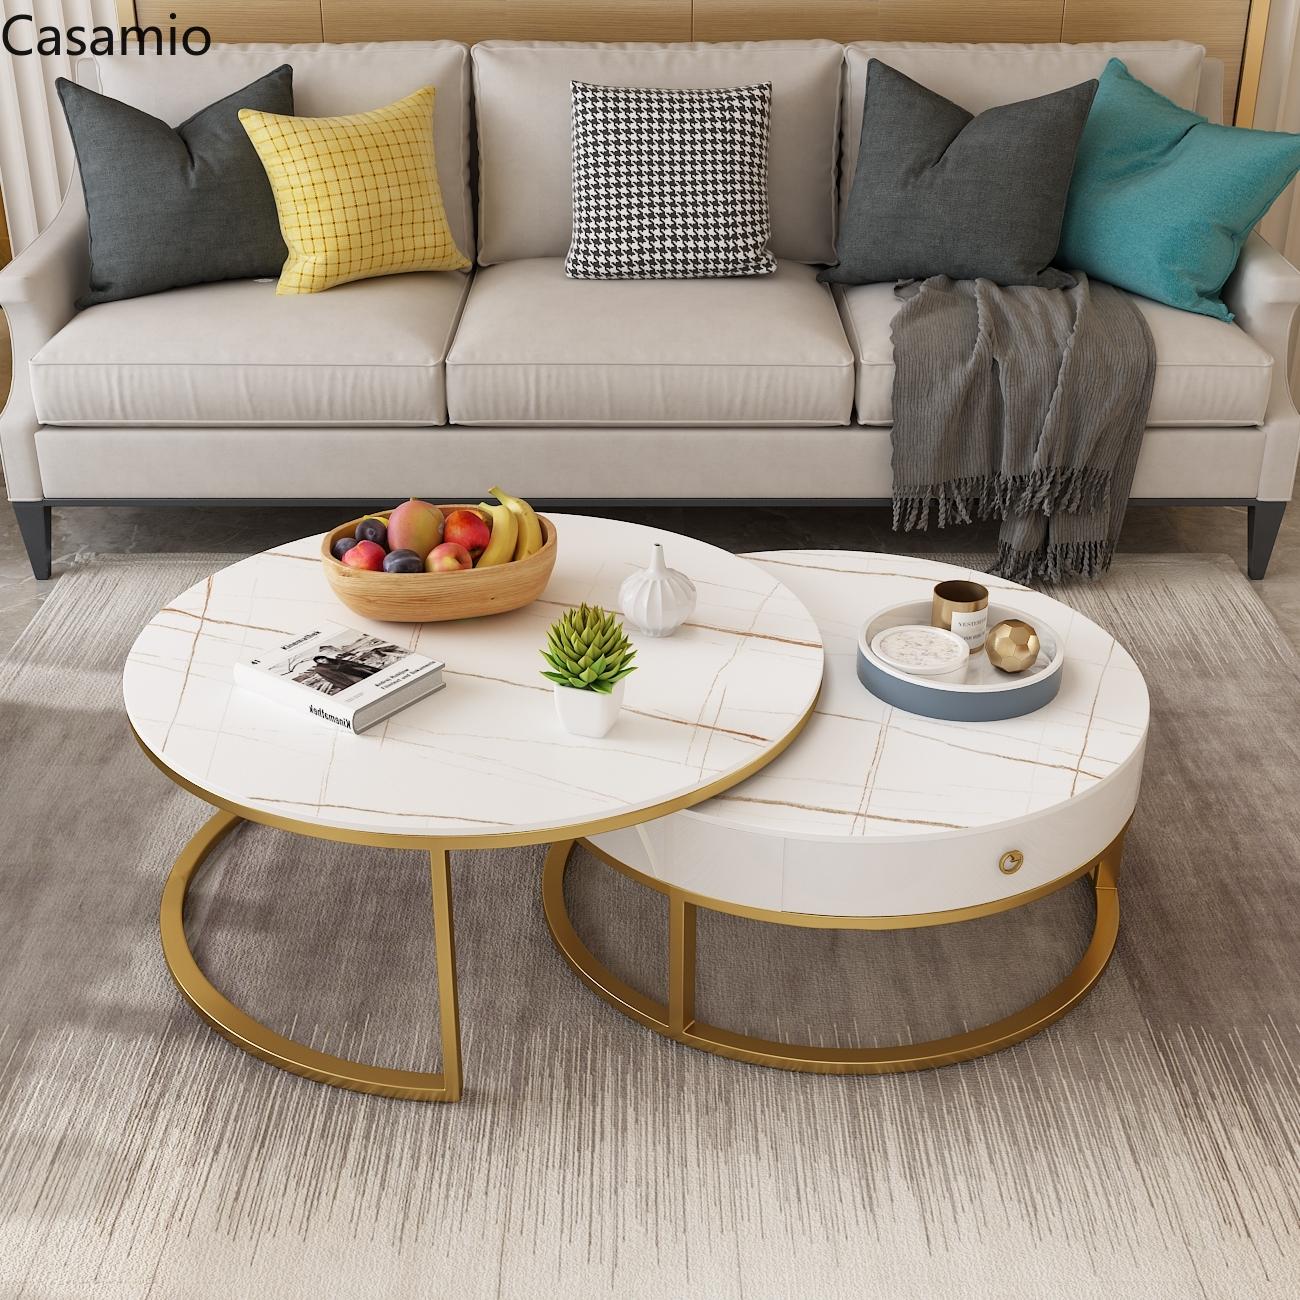 Real Marble Coffee Table Set Italian Slate Coffee Table Nordic Tea Table With Drawer Living Room Storage Table Set Modern Shopee Singapore